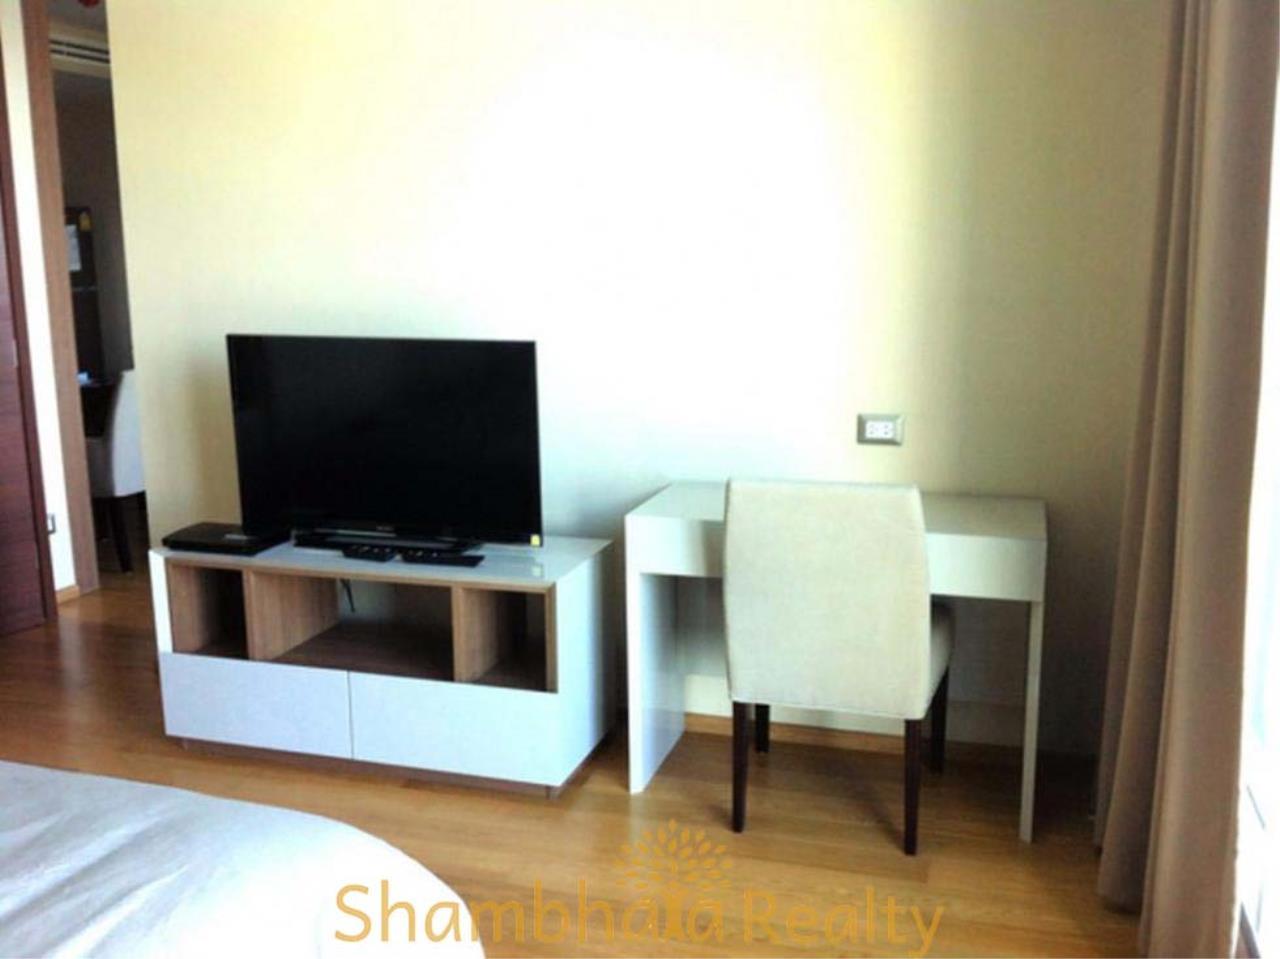 Shambhala Realty Agency's The Address Asoke Condominium for Rent in New Phetchburi 11